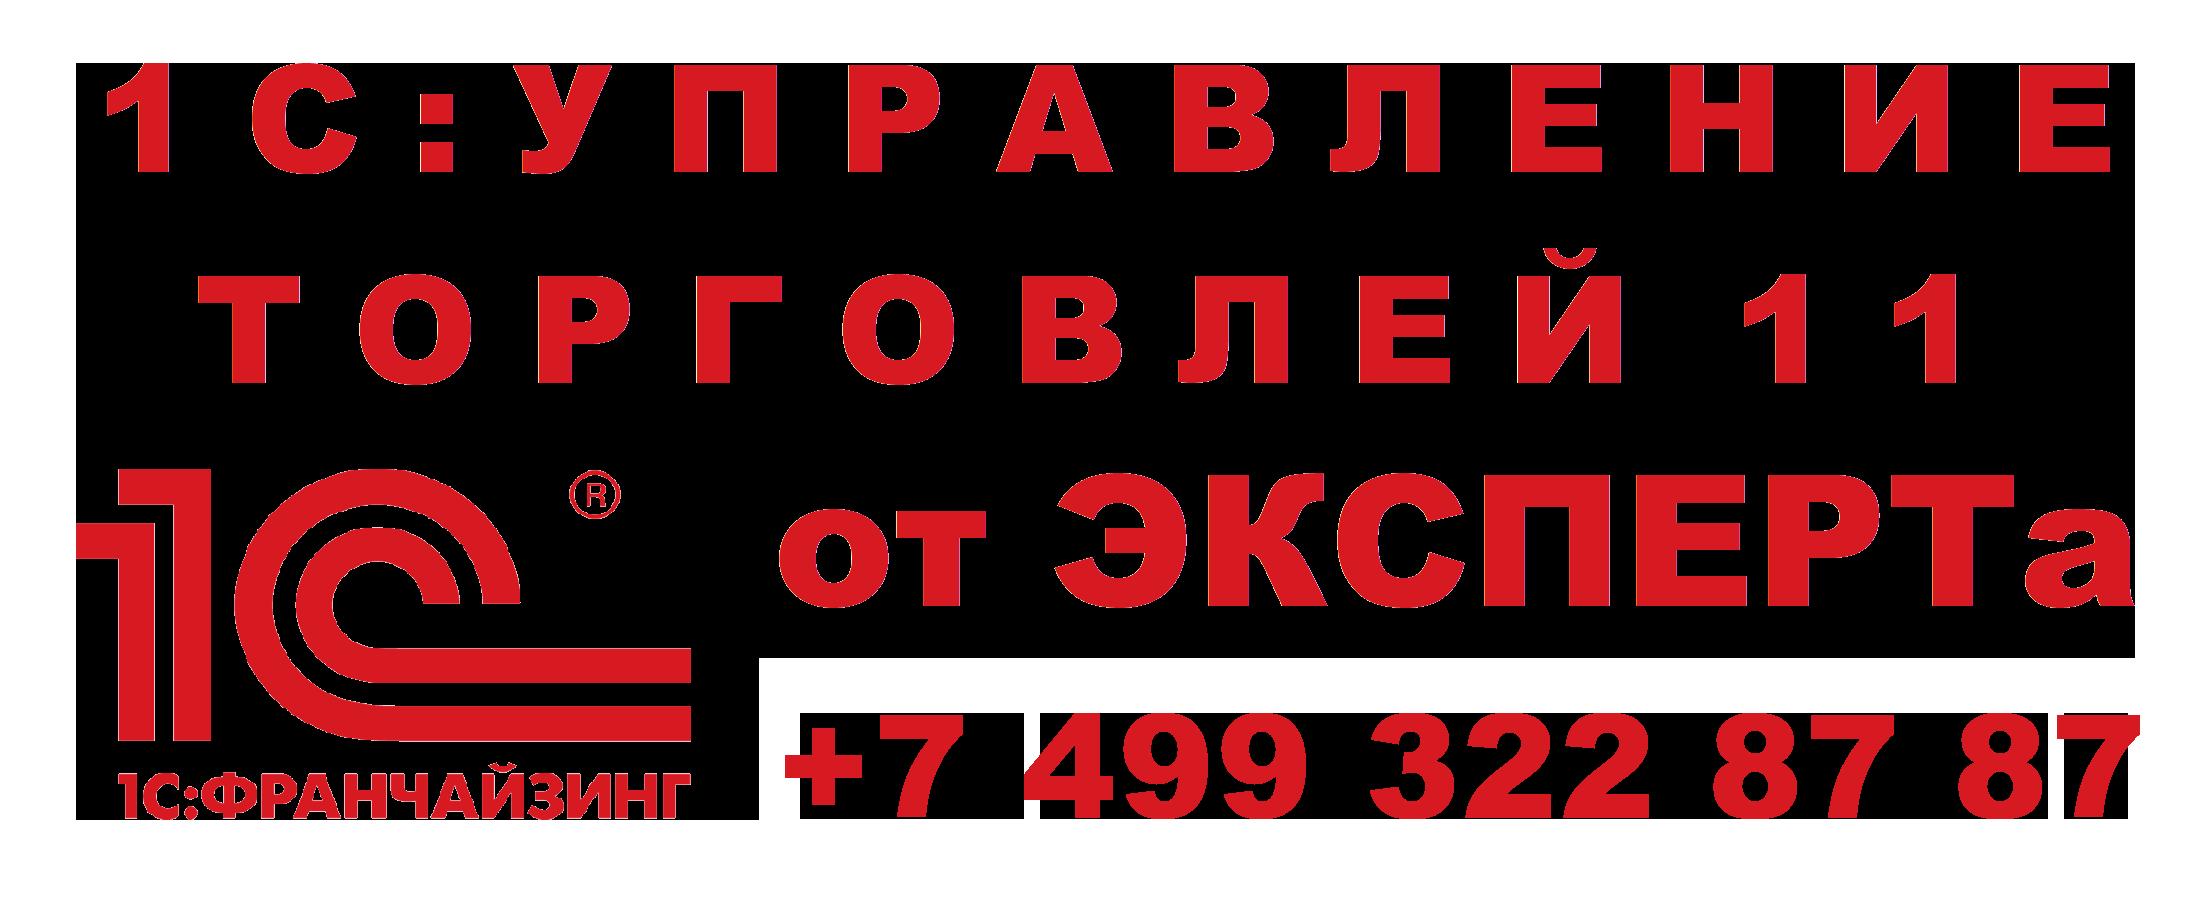 Логотип 1С:УТ от ЭКСПЕРТа